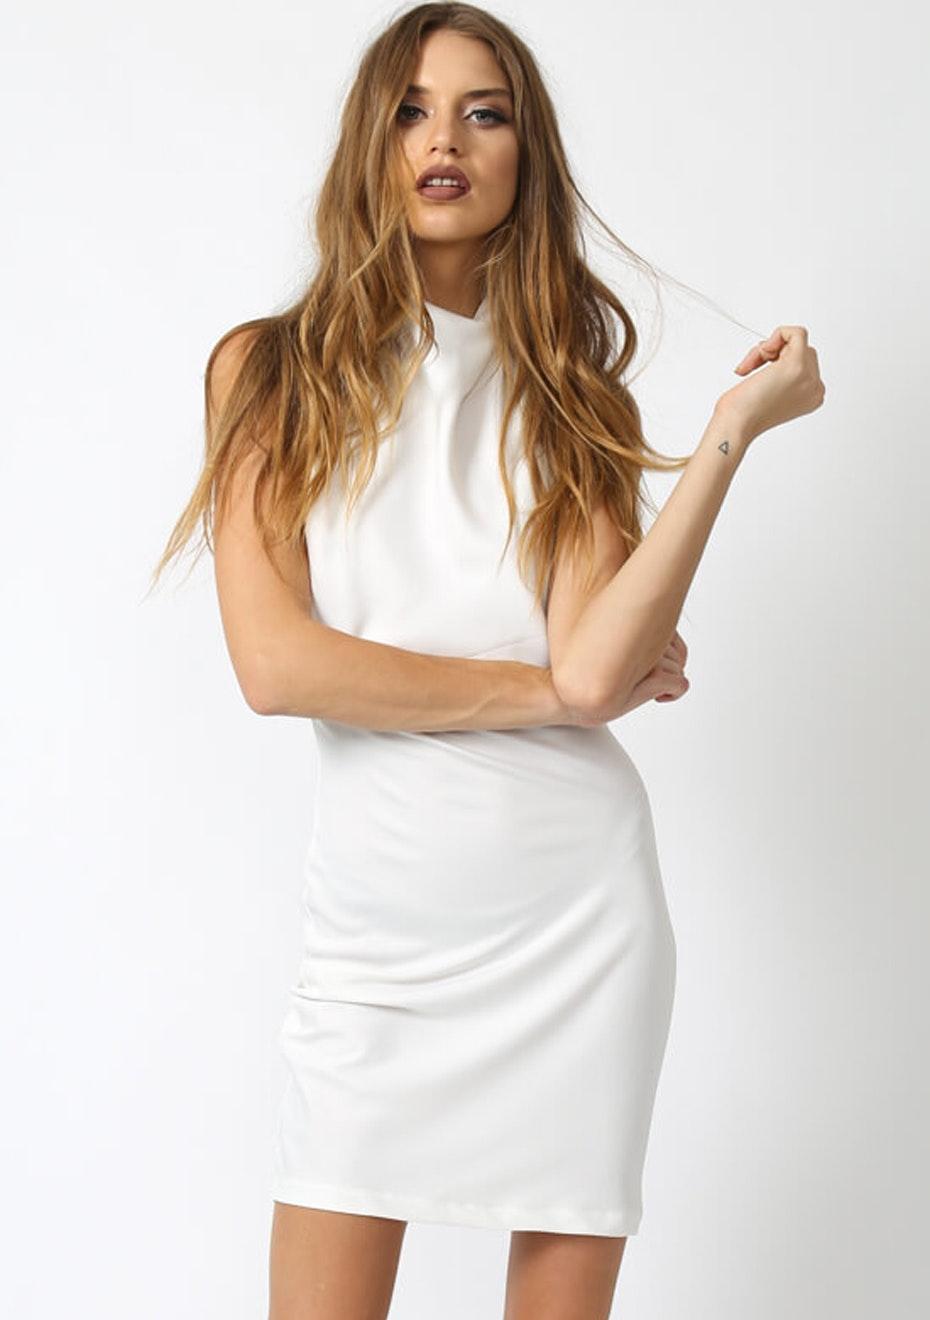 Lioness - Palazzo Bianco Dress - White